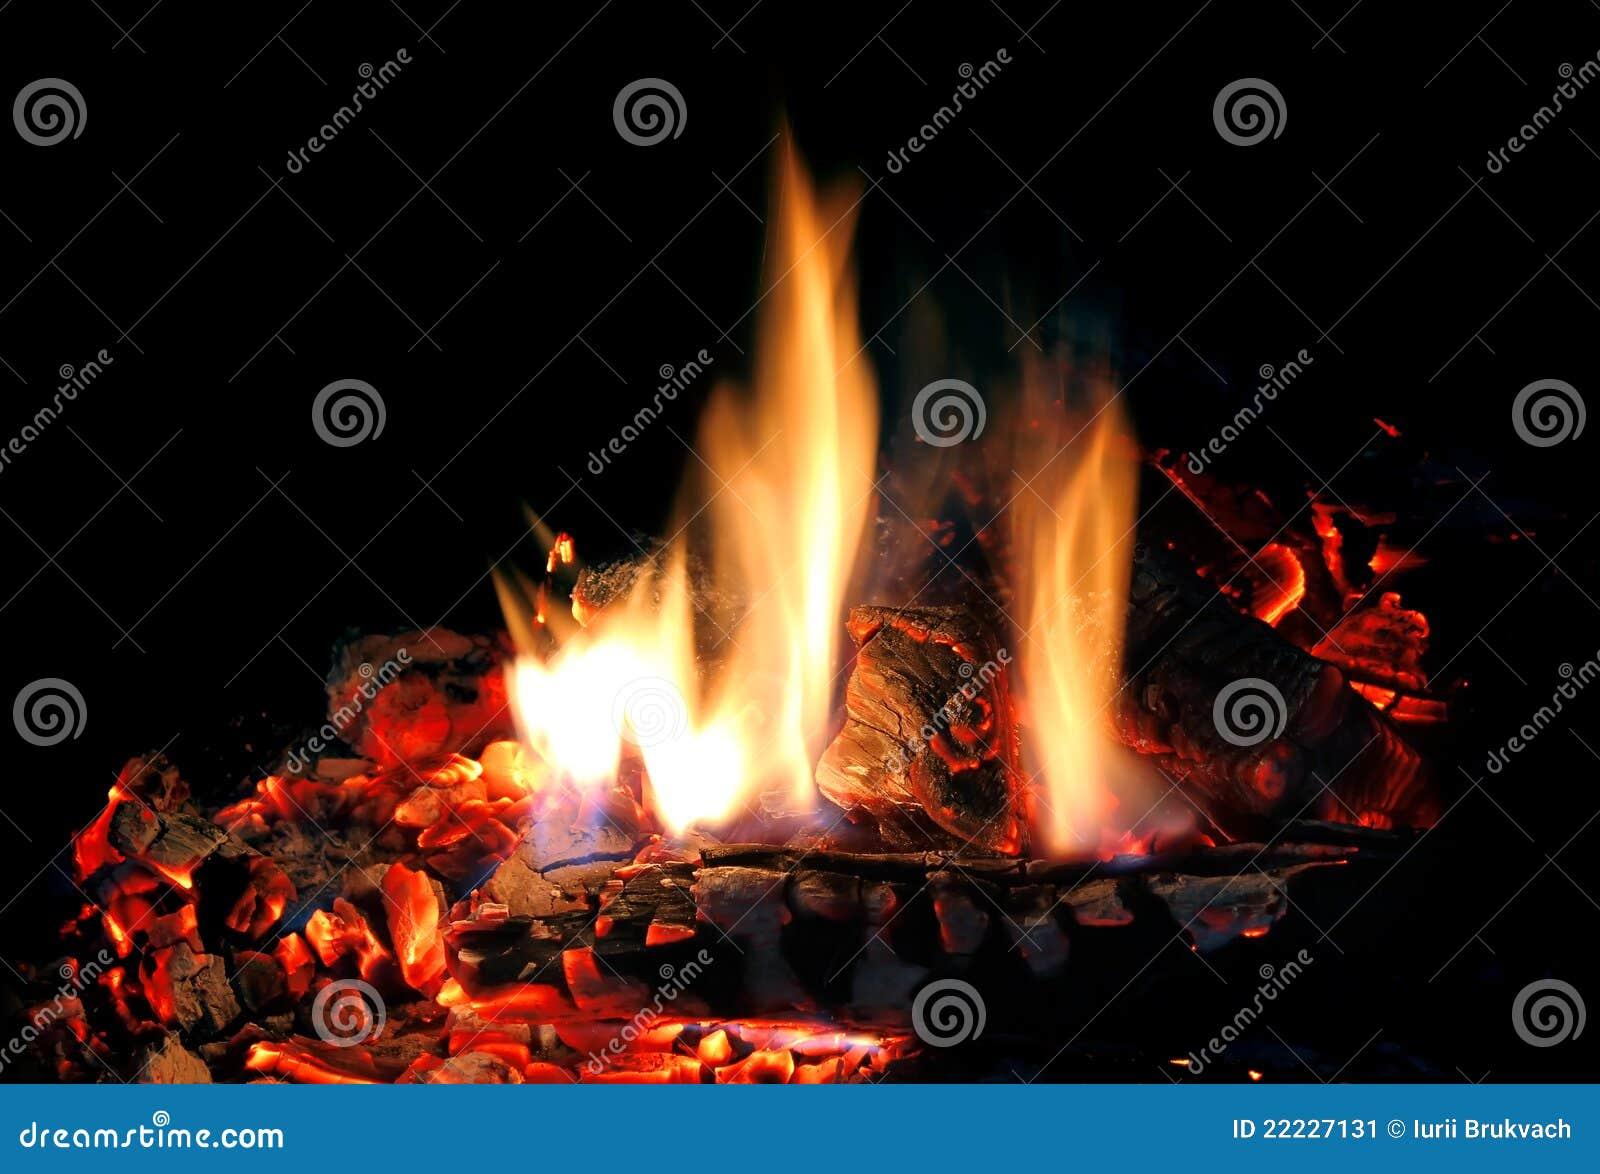 feuer im kamin stockbild bild von flamme brennholz 22227131